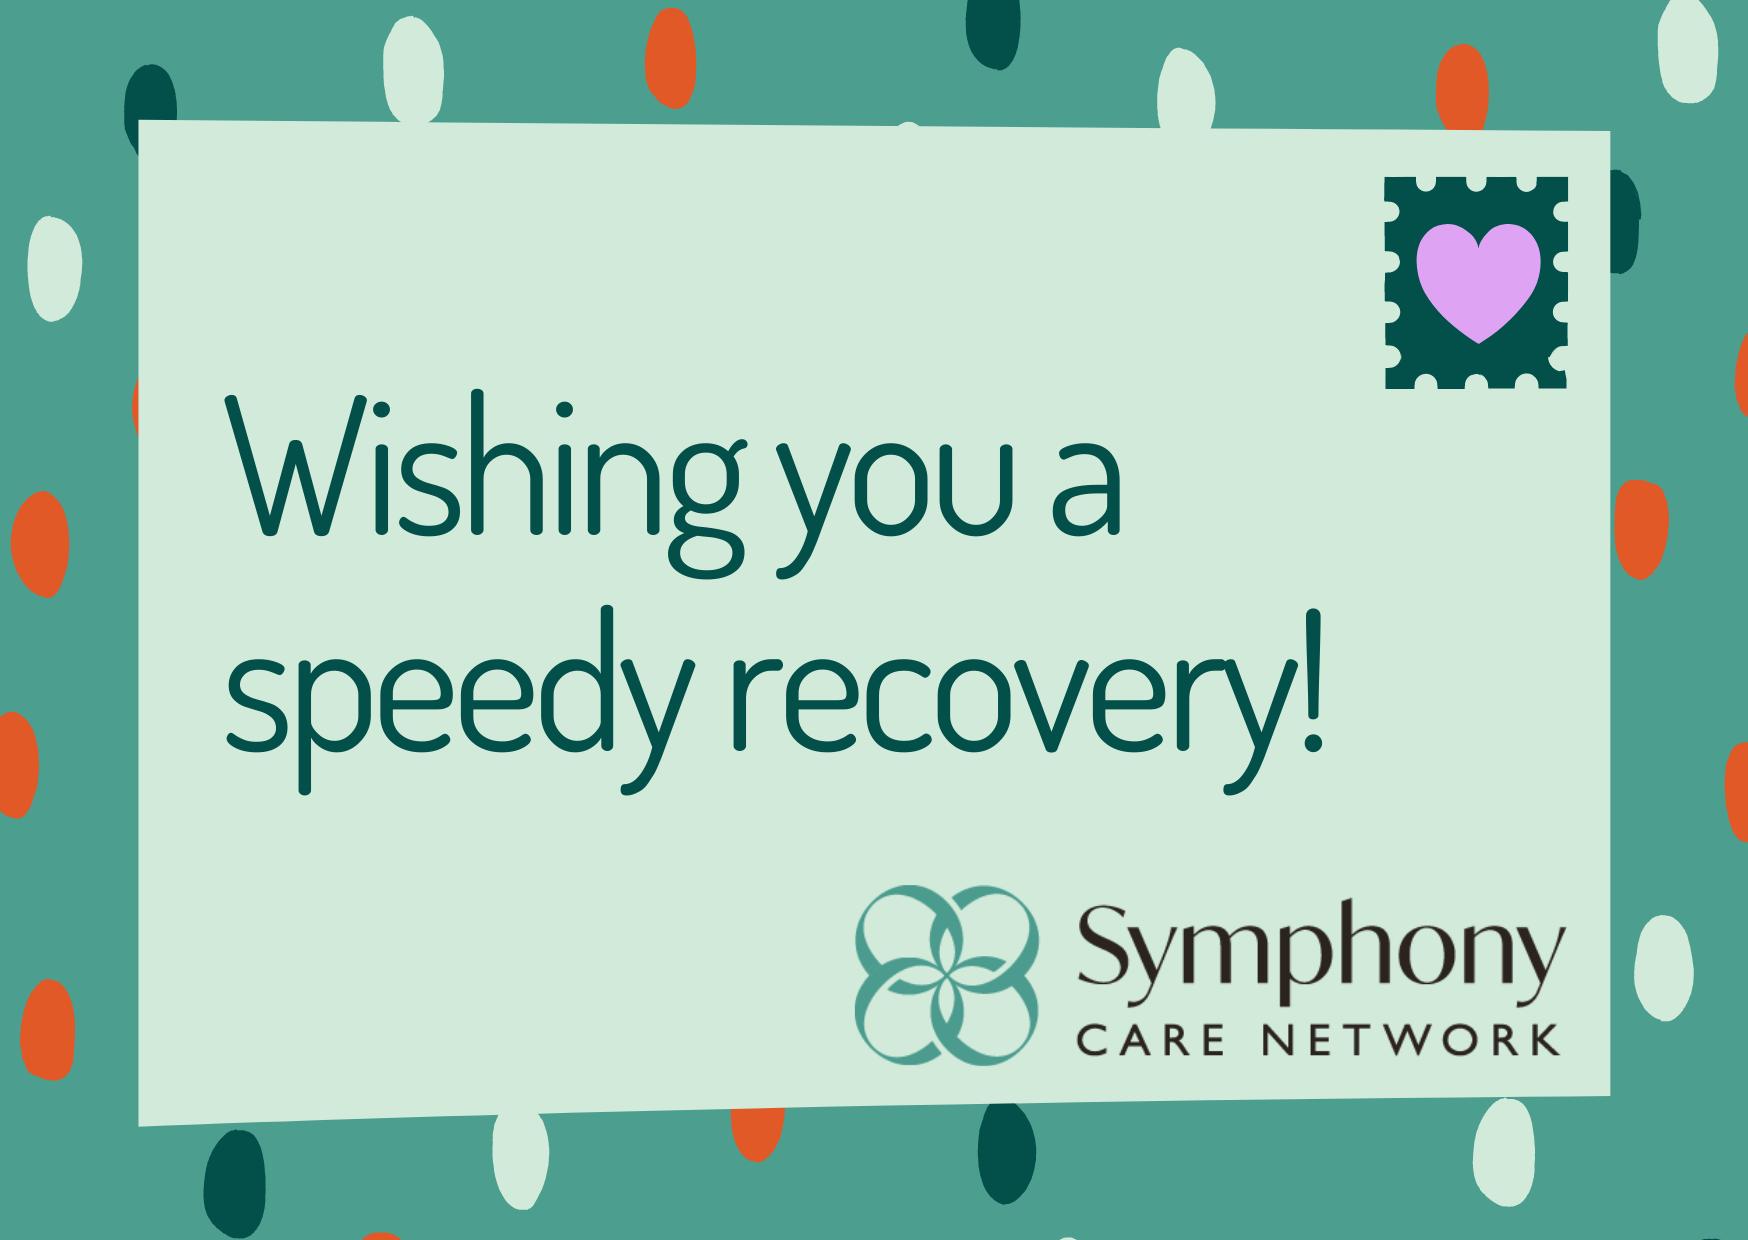 Wishing You A Speedy Recovery!